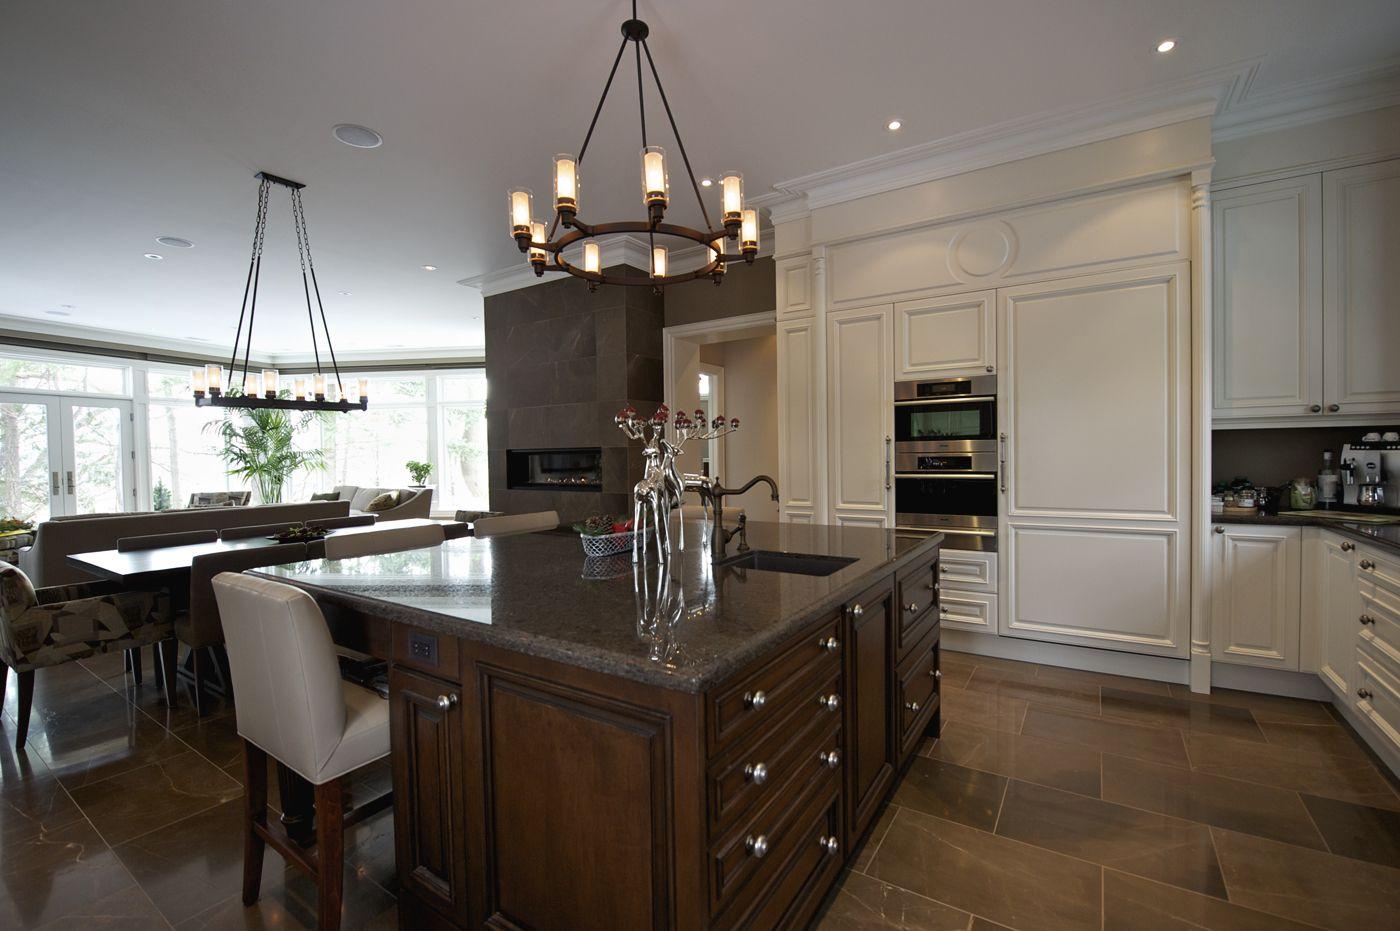 Trransitional Kitchen Designs  Transitional Kitchens Give You Glamorous Transitional Kitchen Design Decorating Design